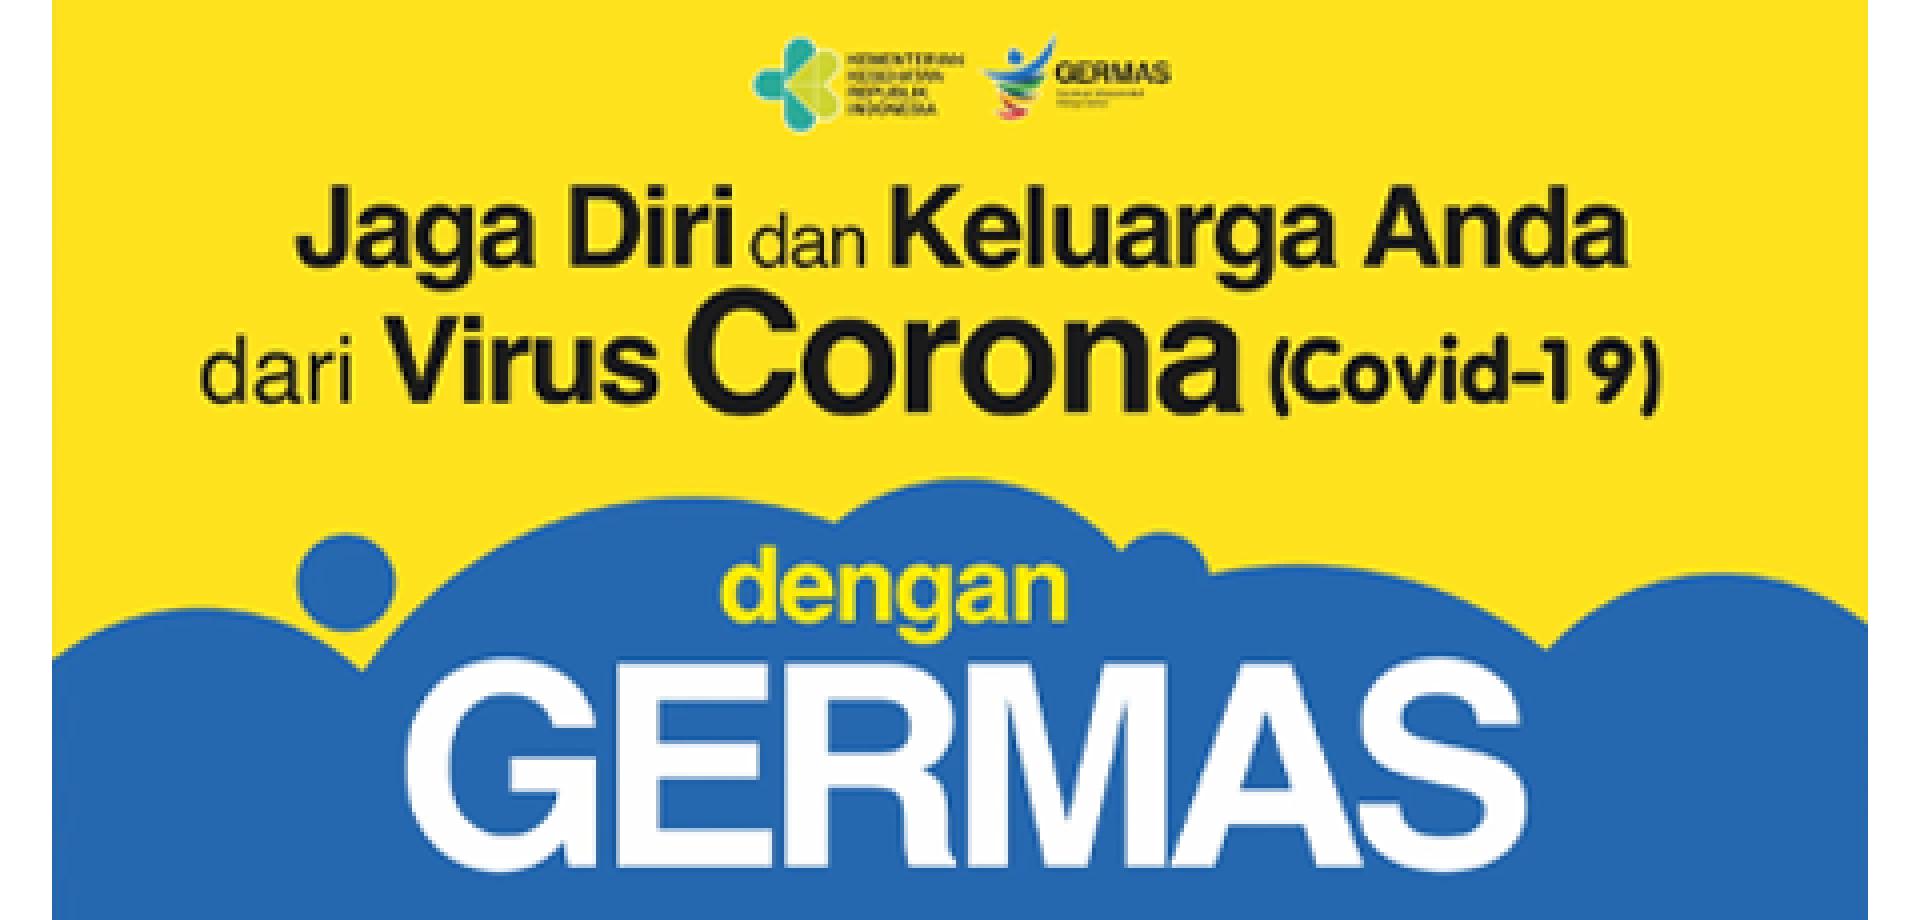 Jaga diri dan Keluarga dari Virus Corona (COVID-19) dengan Germas